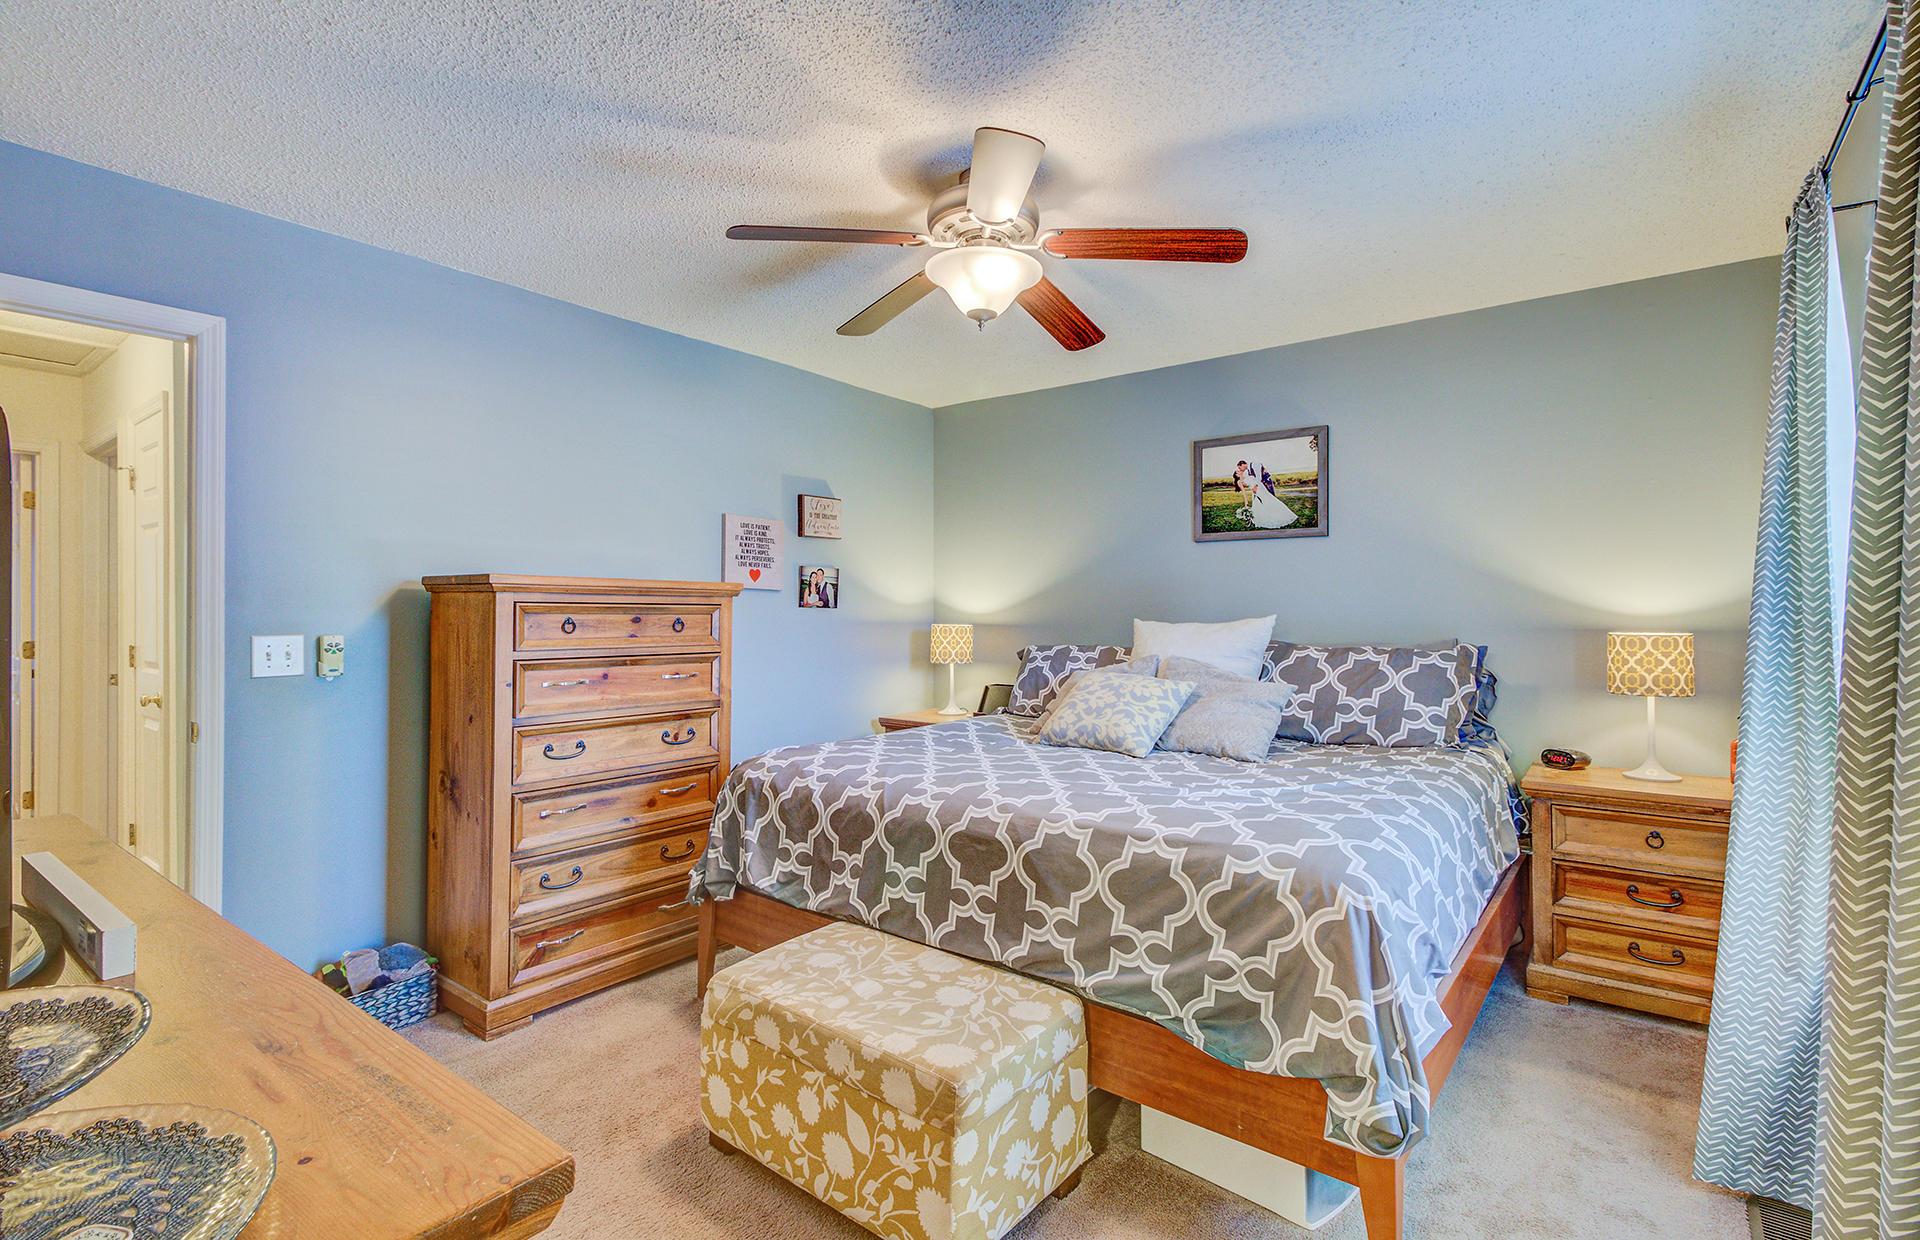 Wando East Homes For Sale - 1664 Hunters Run, Mount Pleasant, SC - 8